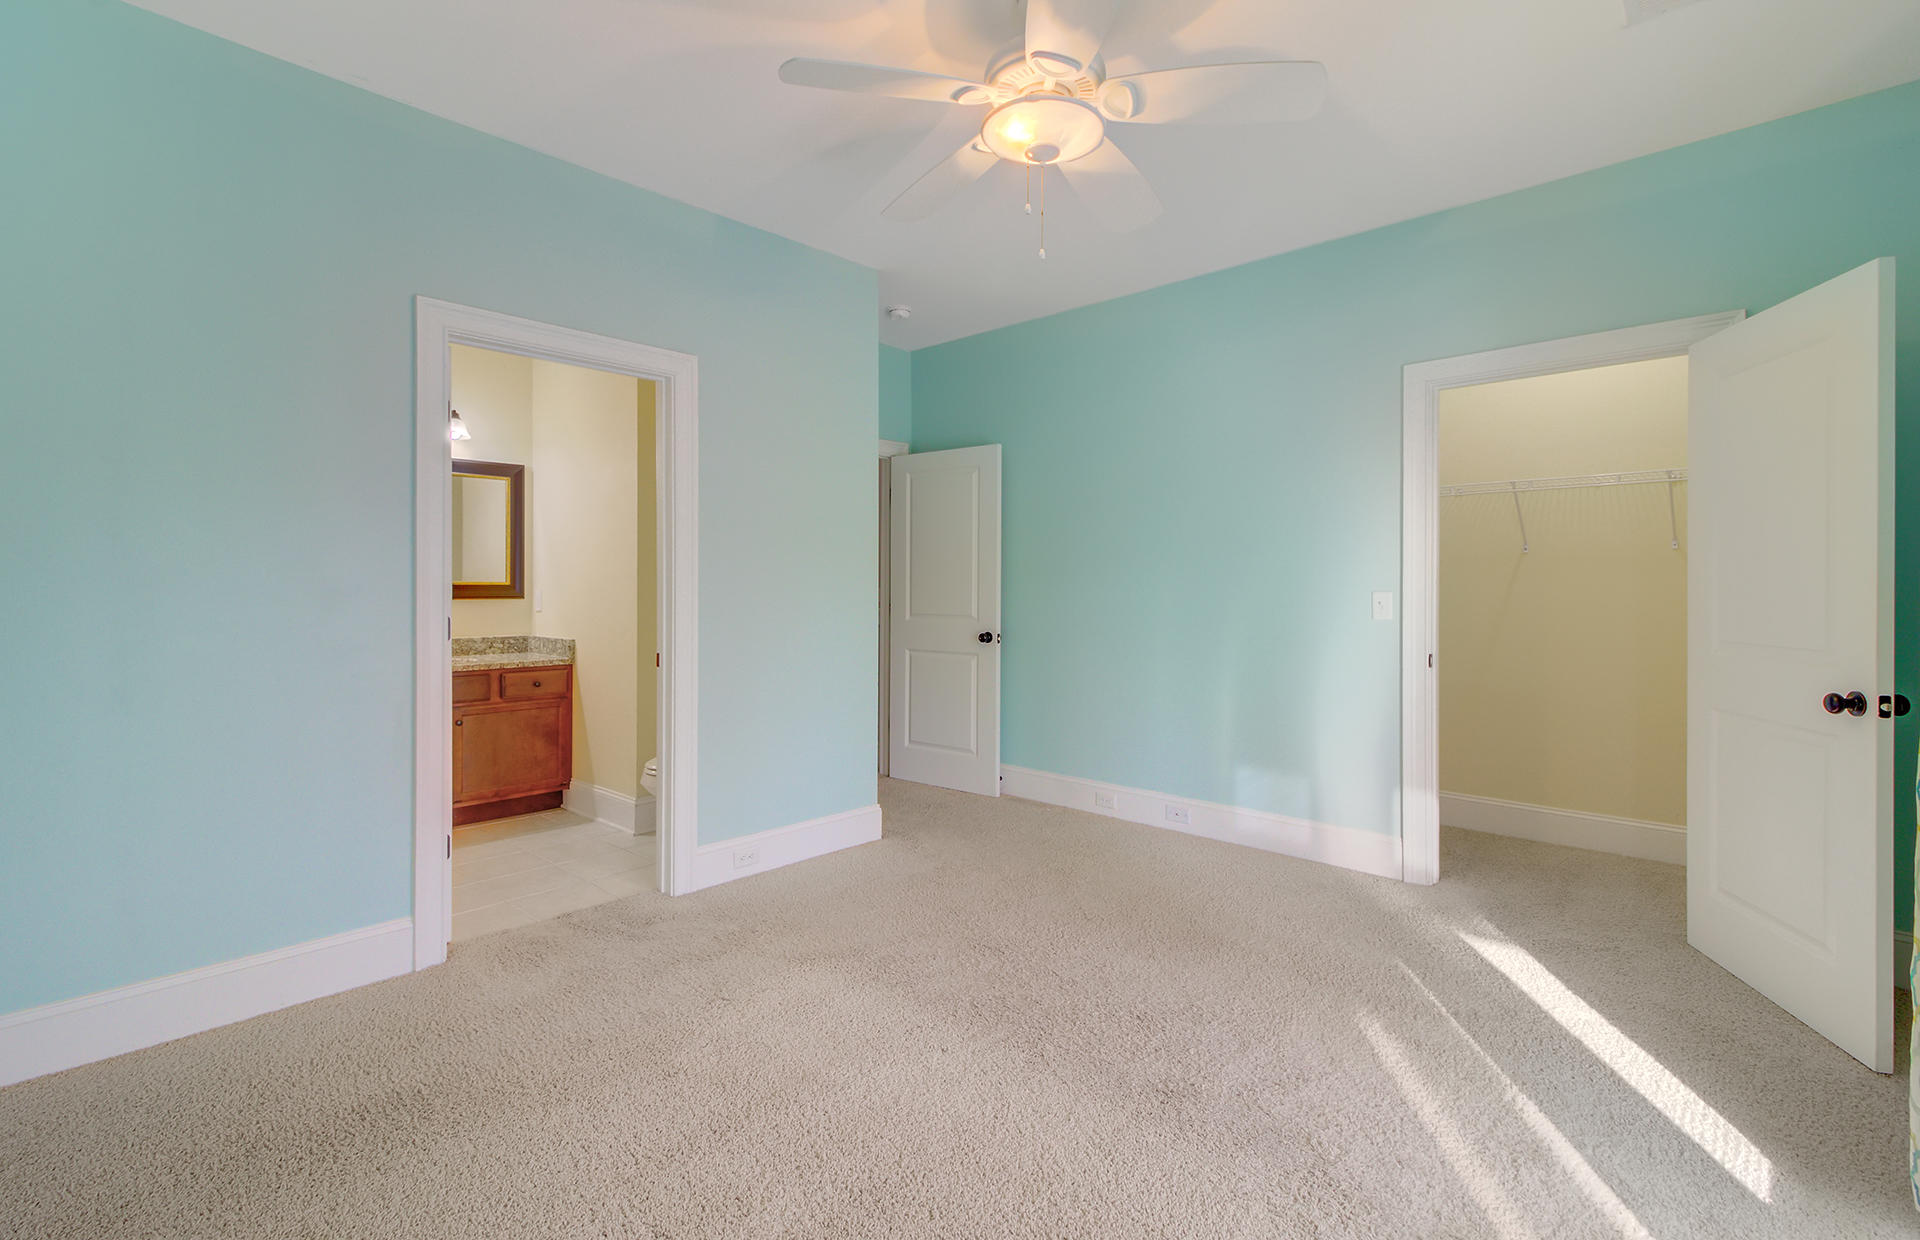 Carol Oaks Town Homes Homes For Sale - 2960 Emma, Mount Pleasant, SC - 17